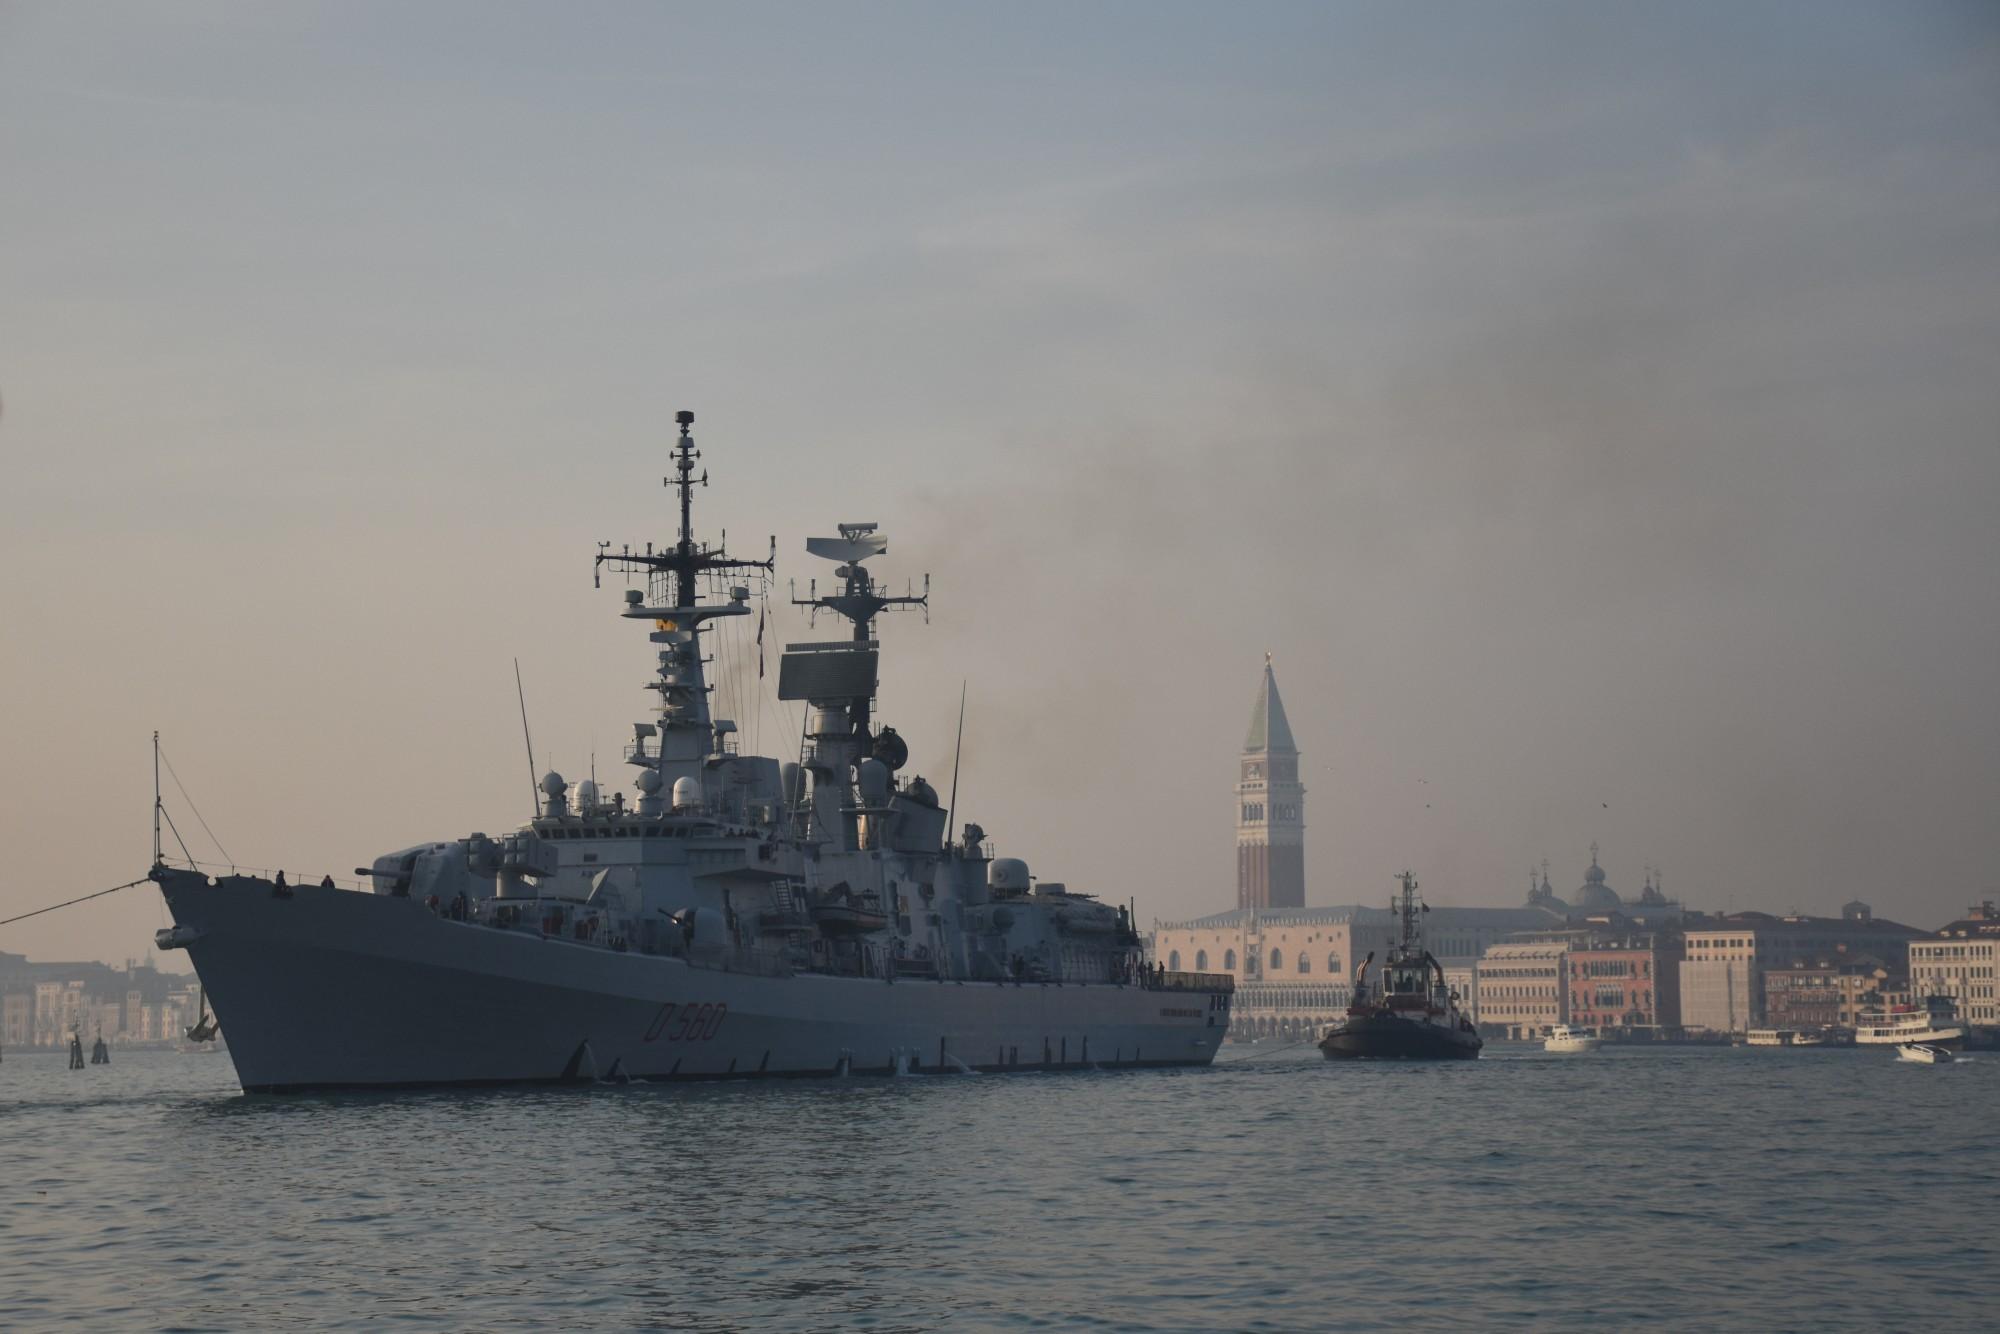 Nave di guerra a Venezia